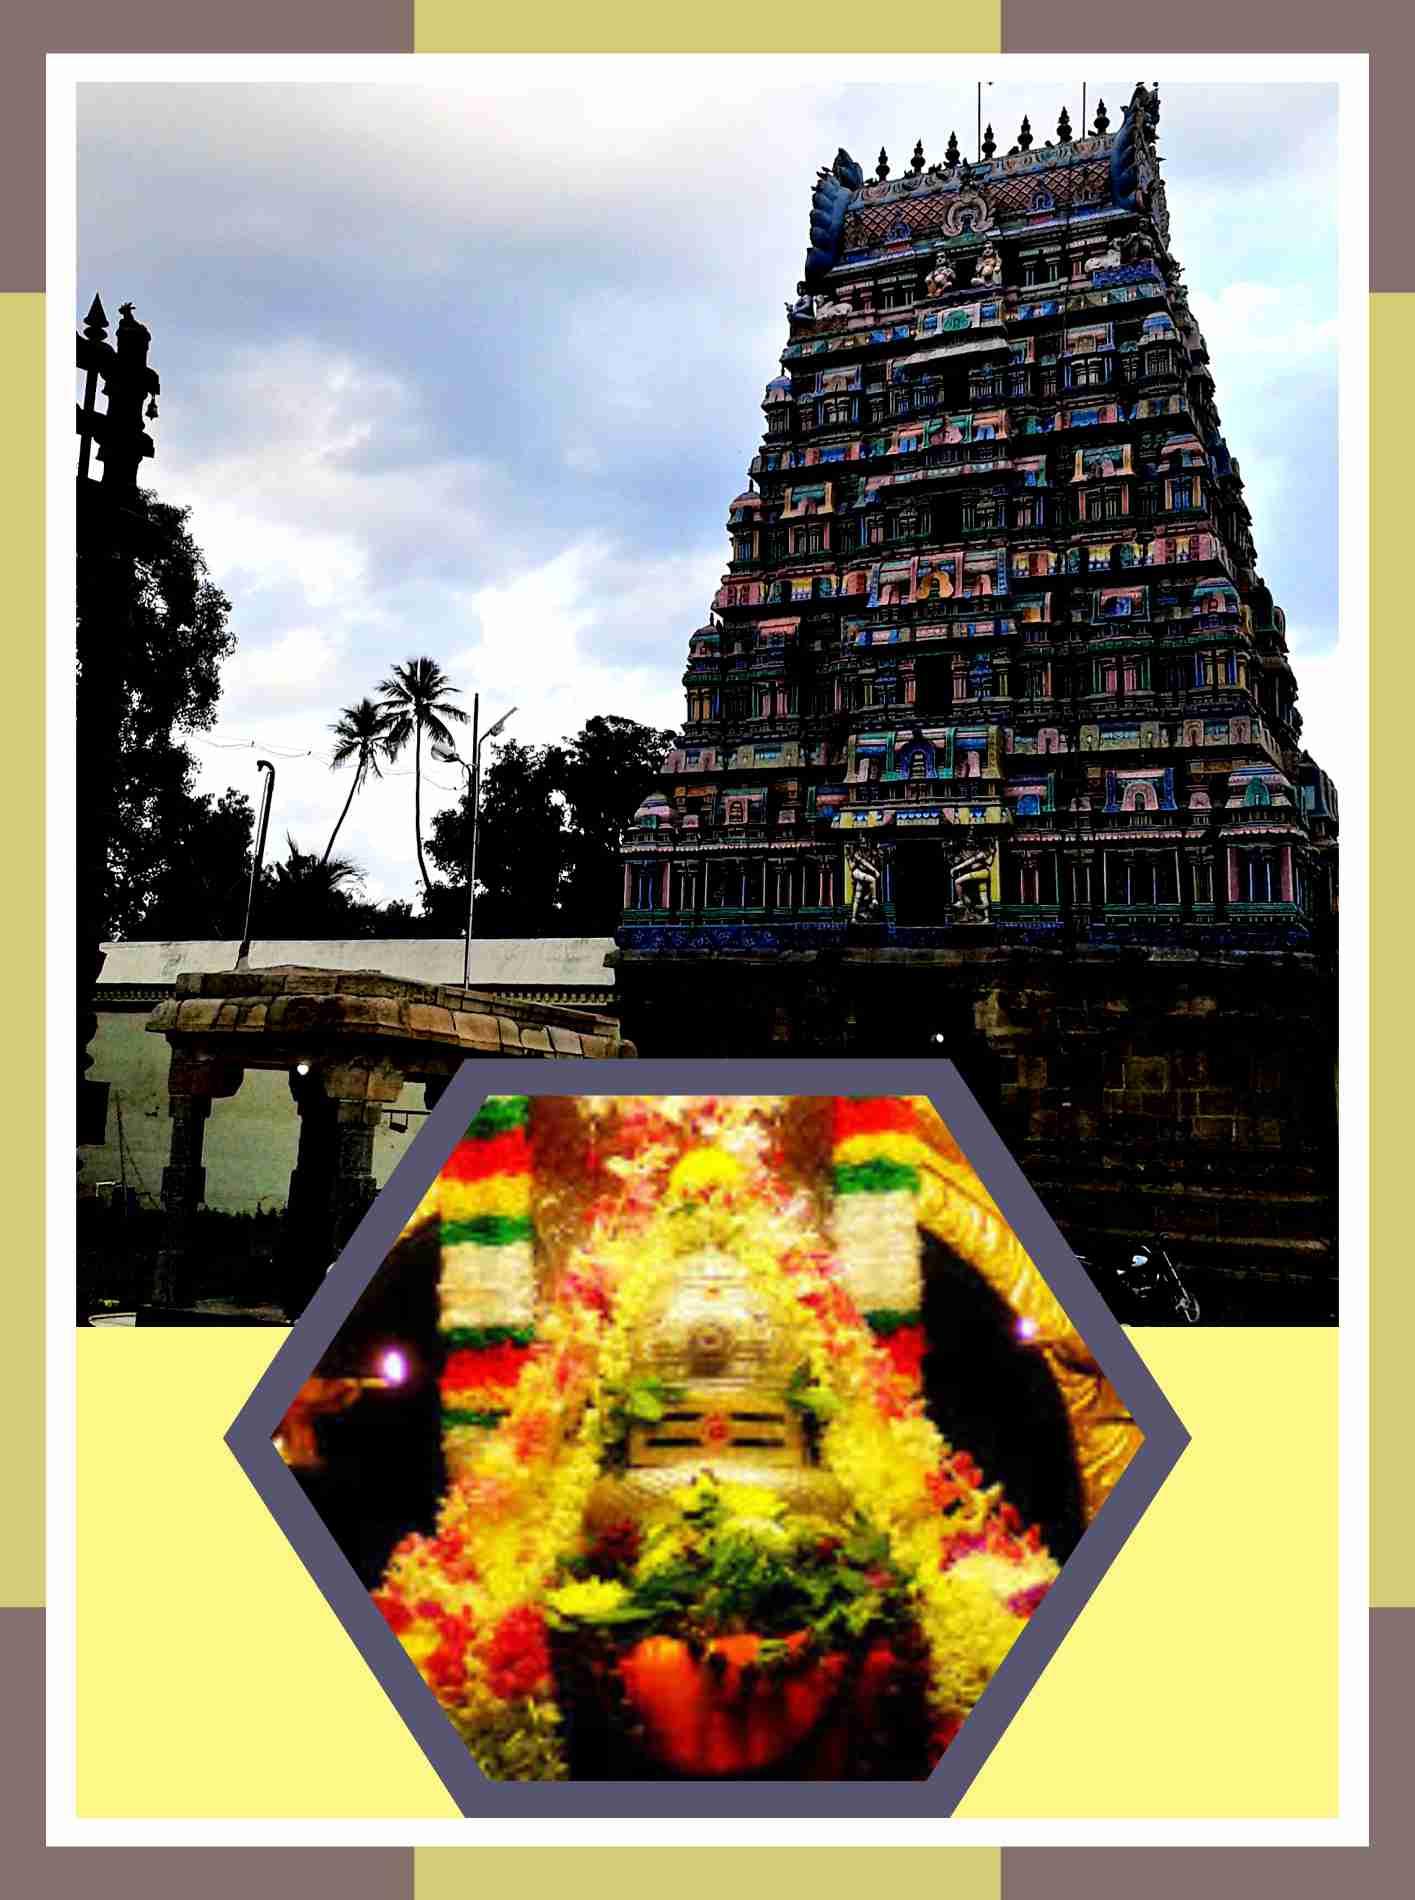 Uthiramerur - Kedareshwarar Kedharagowri Temple Abishekam for Swamy and Ambal